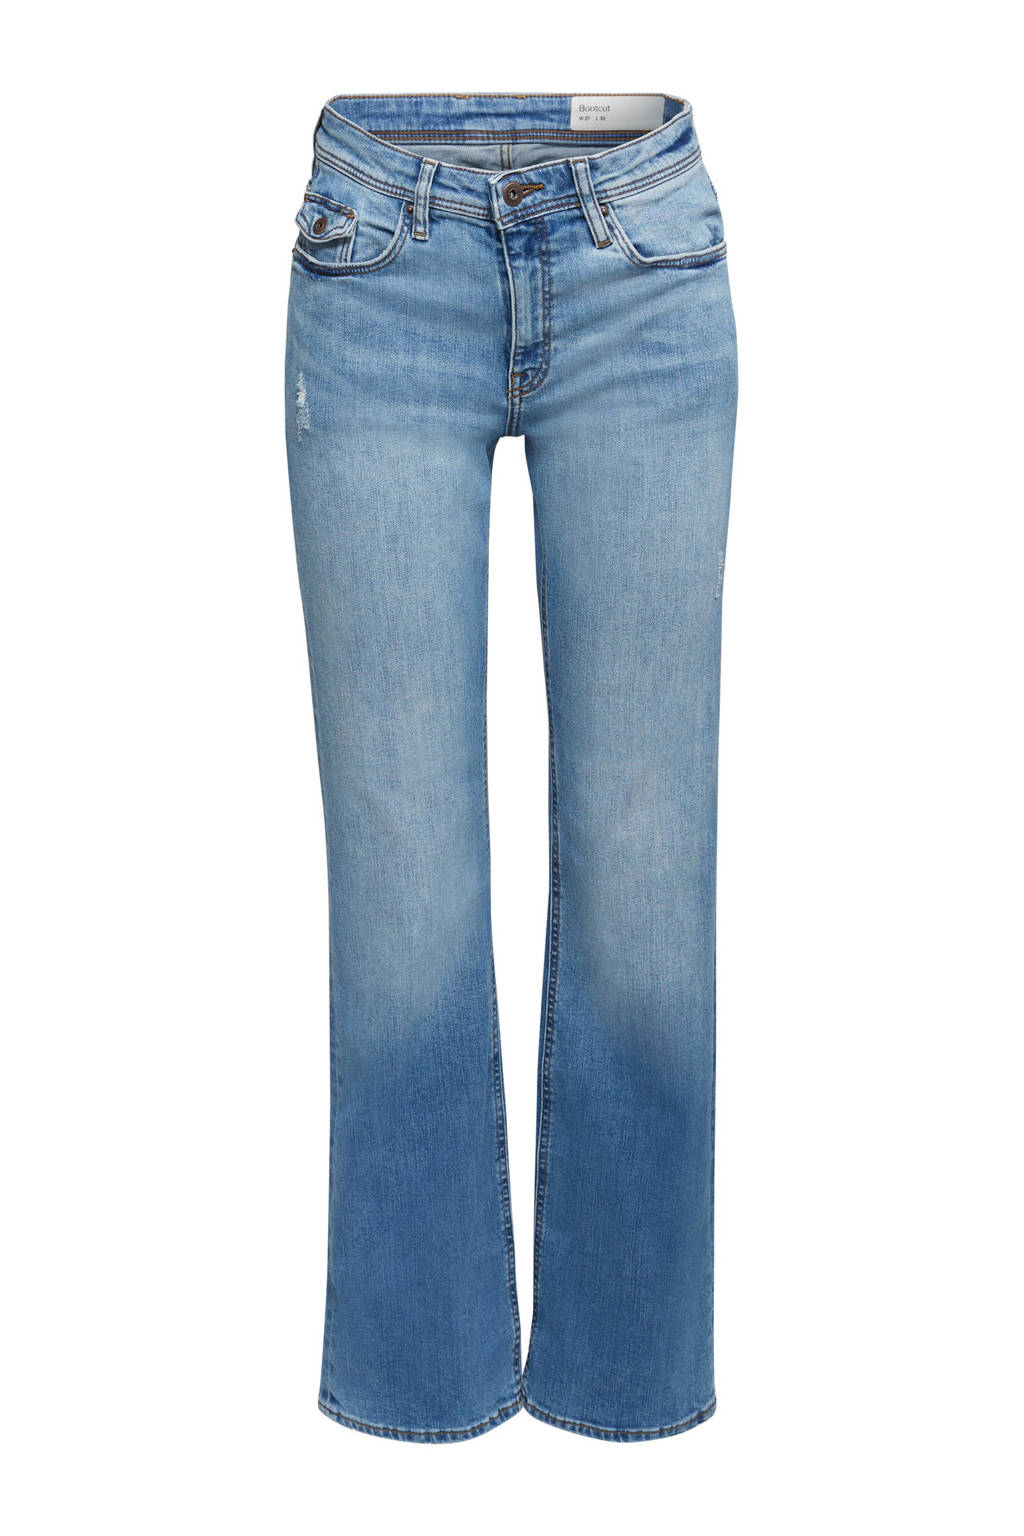 edc Women bootcut jeans light denim stonewashed, Light denim stonewashed